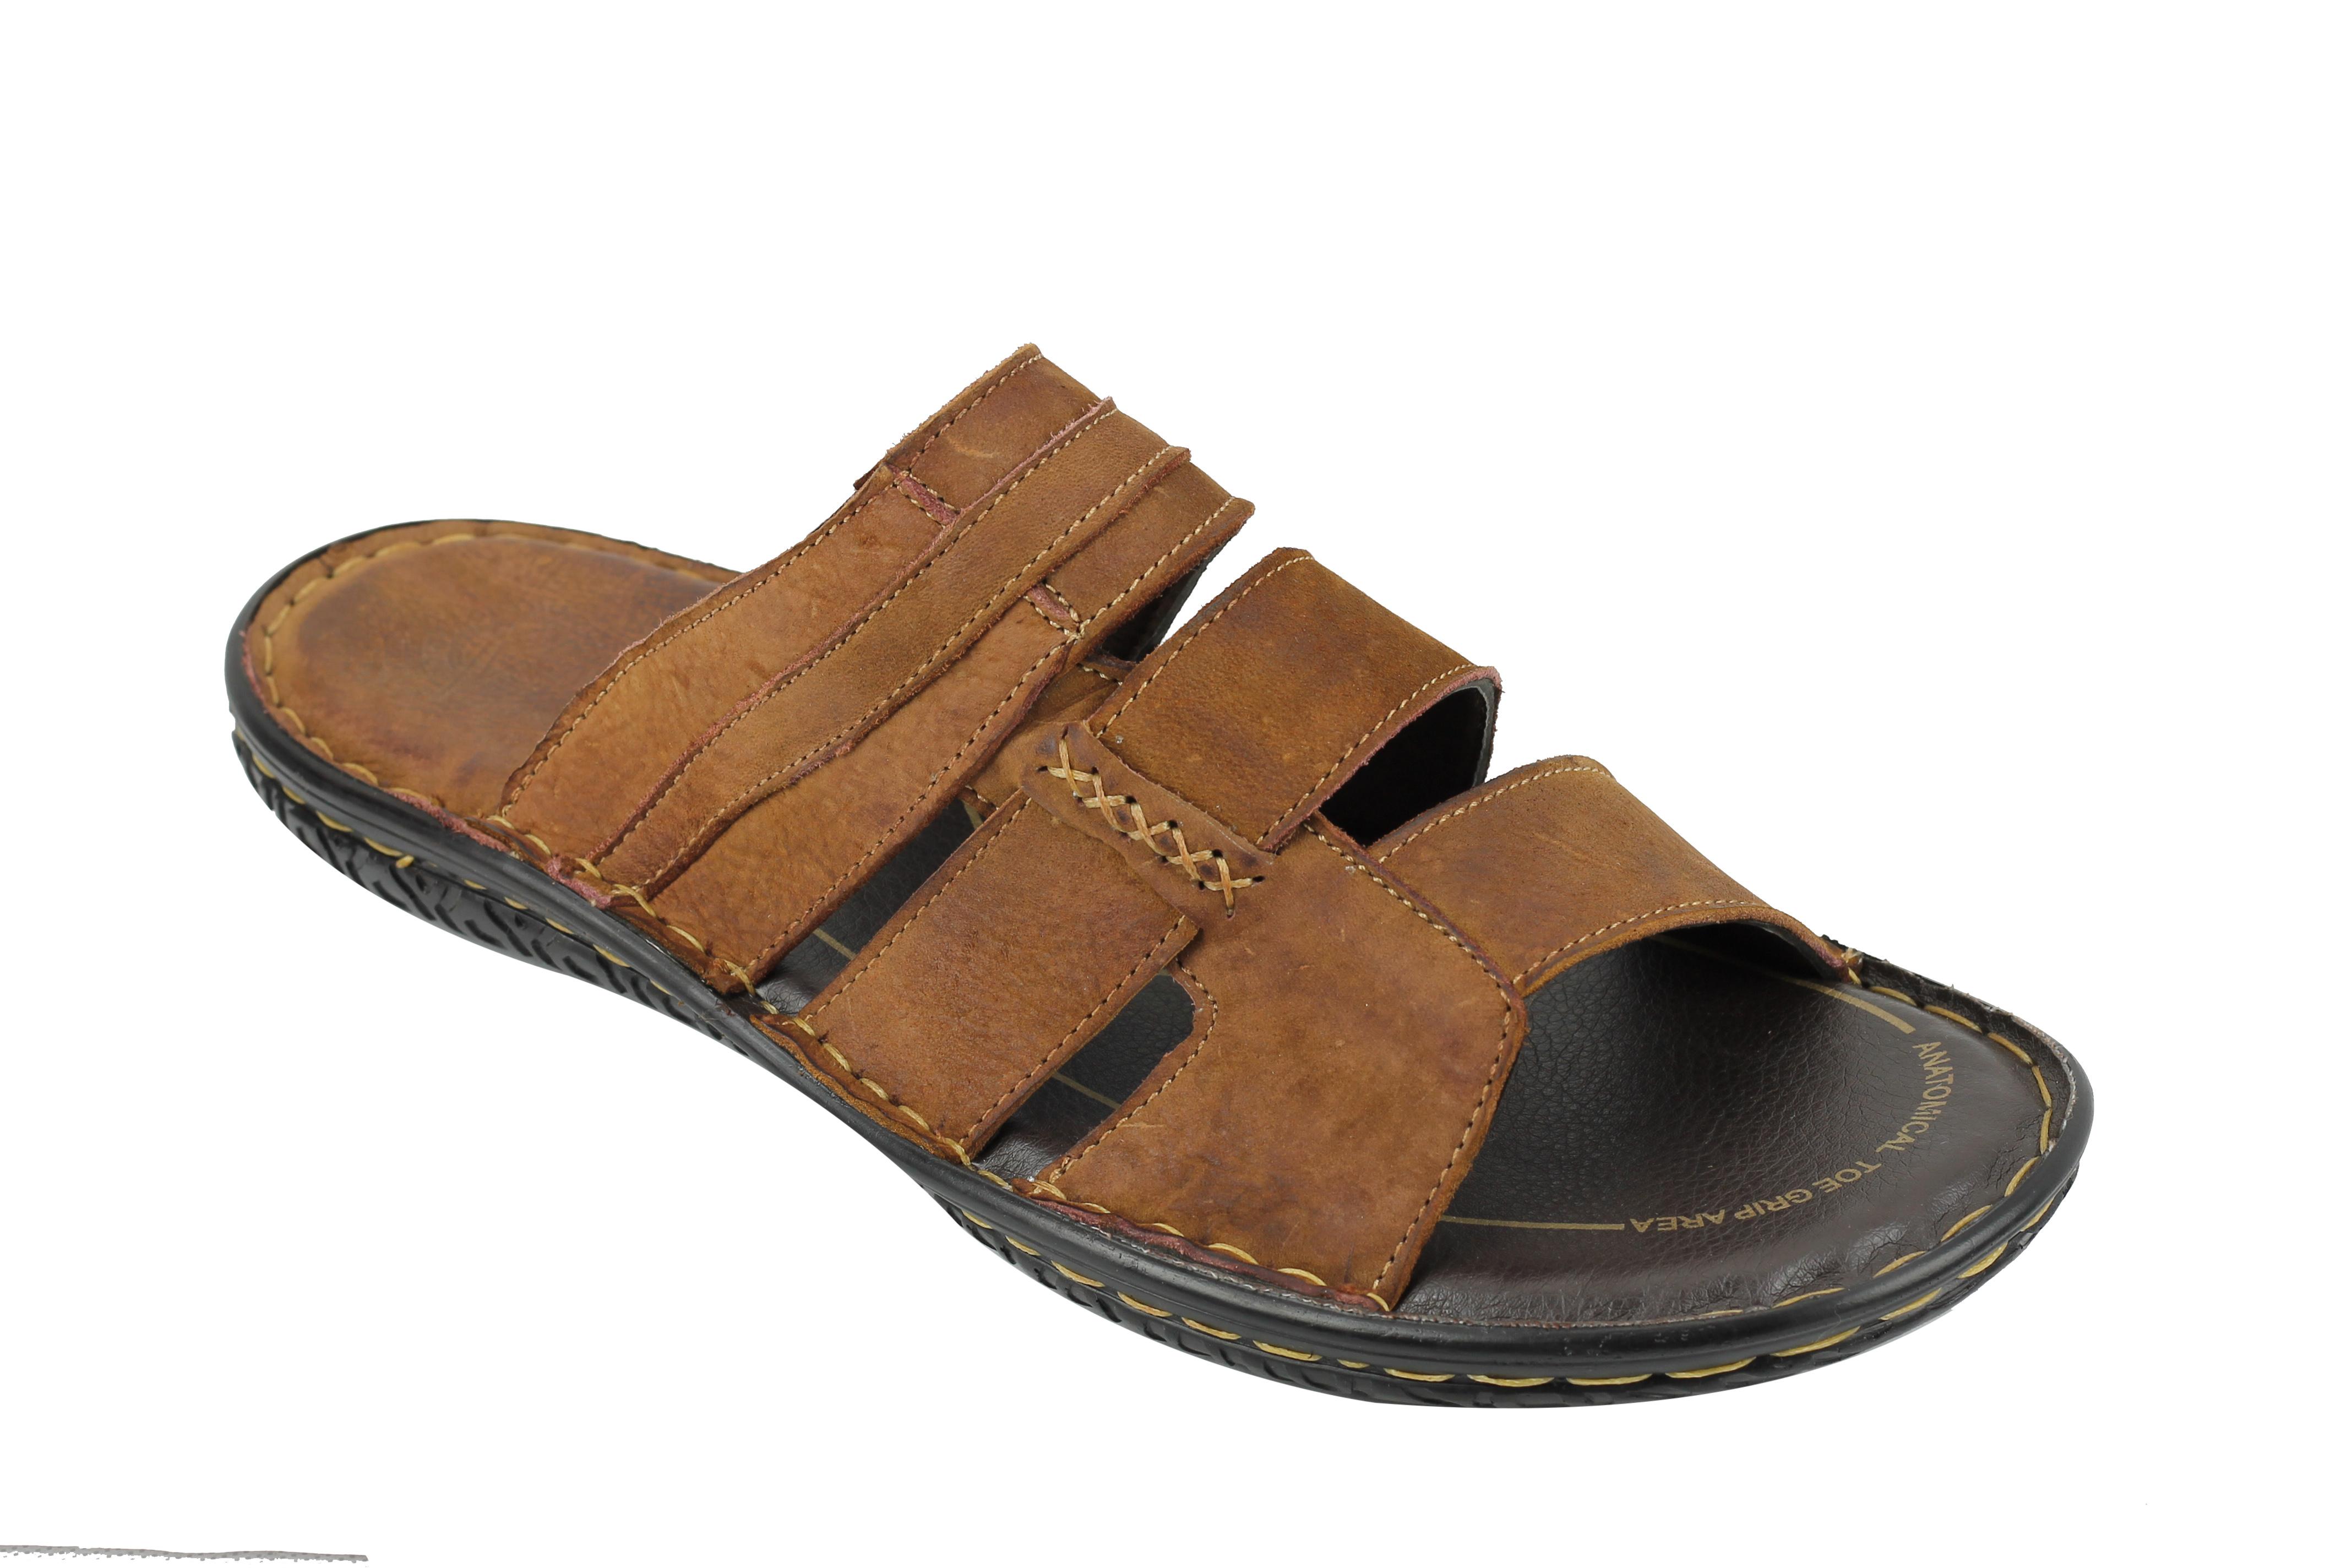 94d79a42a7f Mens Leather Slip on Sandals Black Brown Summer Walking Sliders Open ...